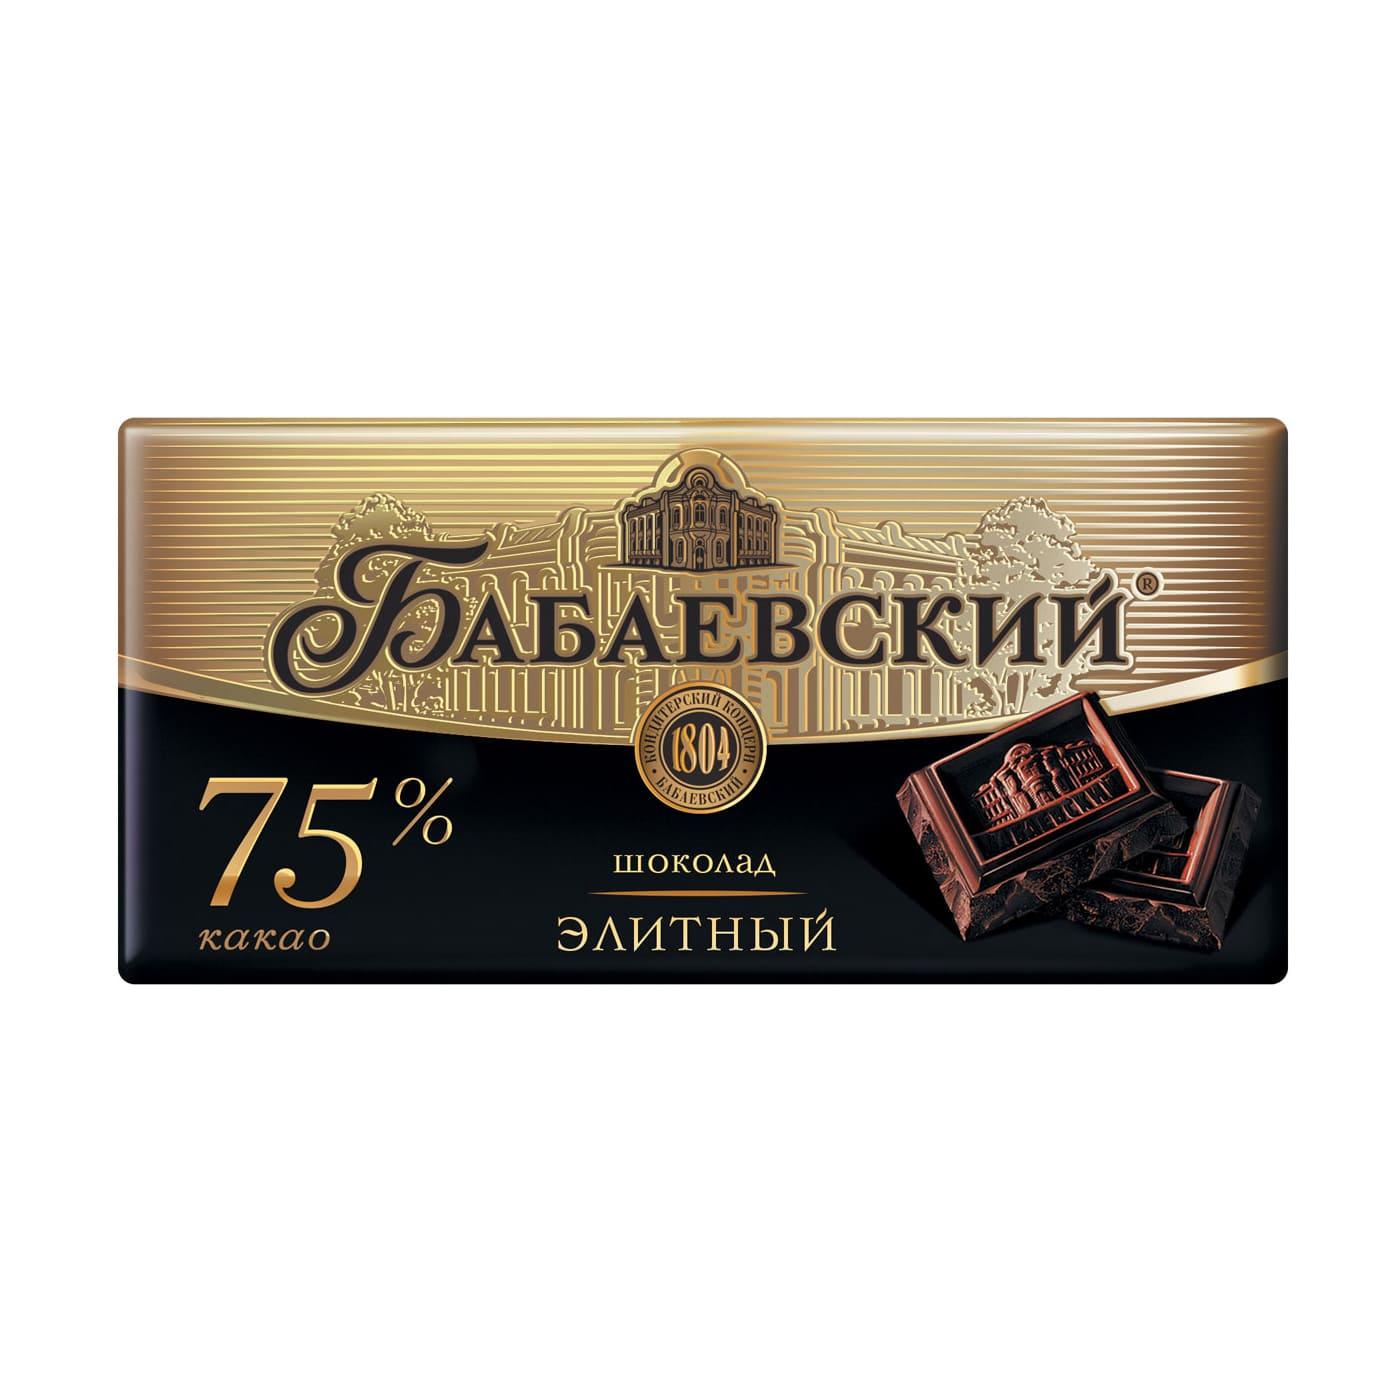 Шоколад  Бабаевский  Элитный 200гр.